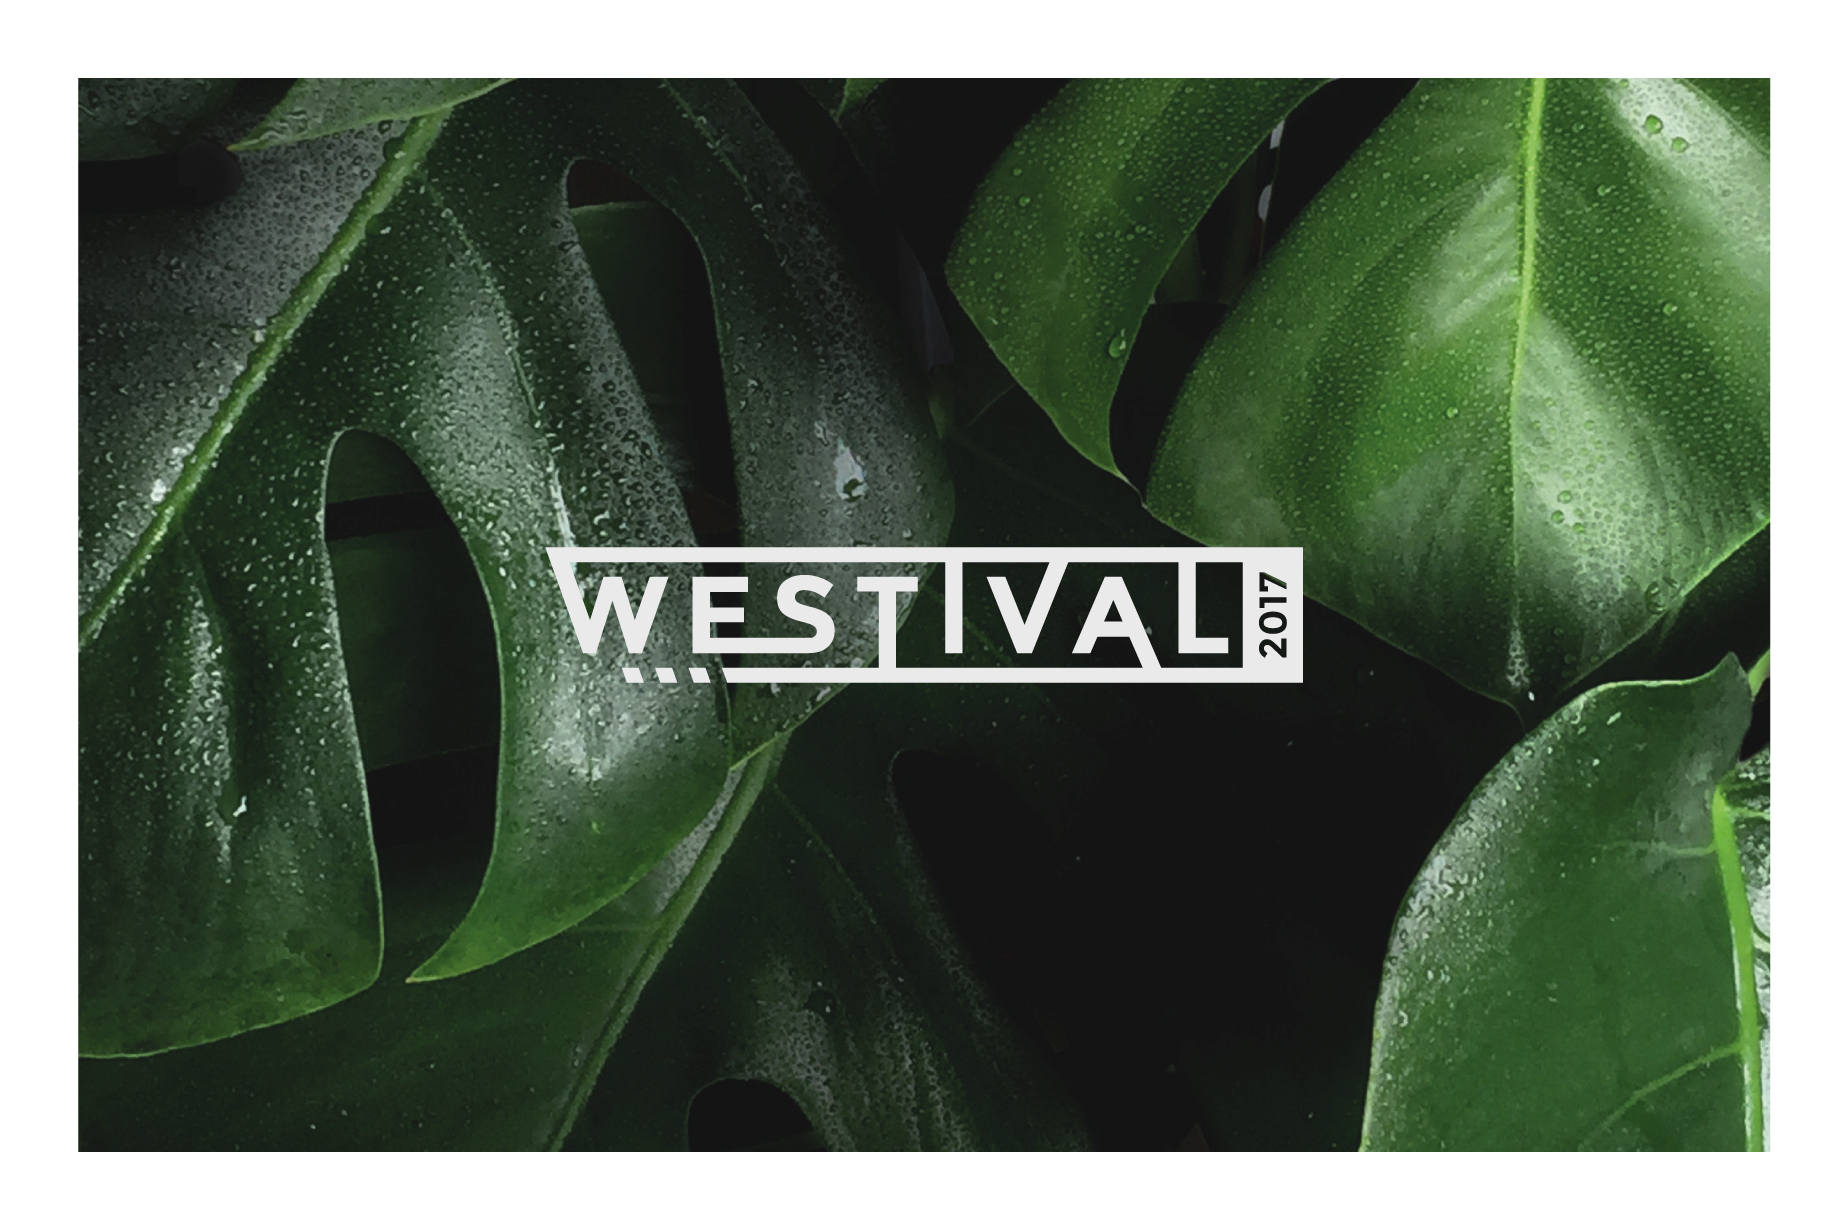 westival.jpg